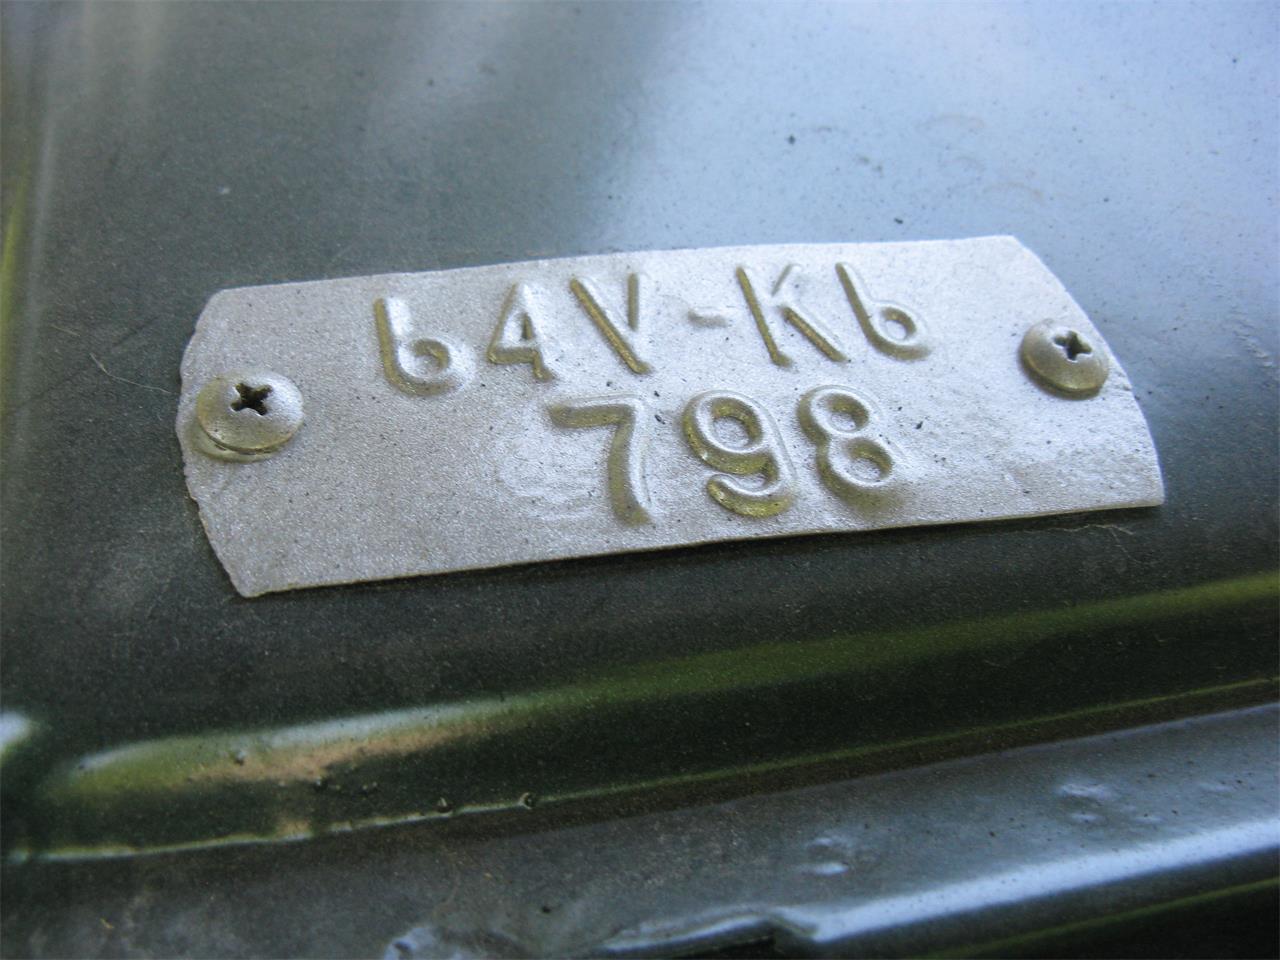 1964 Studebaker Gran Turismo (CC-1359062) for sale in Shaker Heights, Ohio